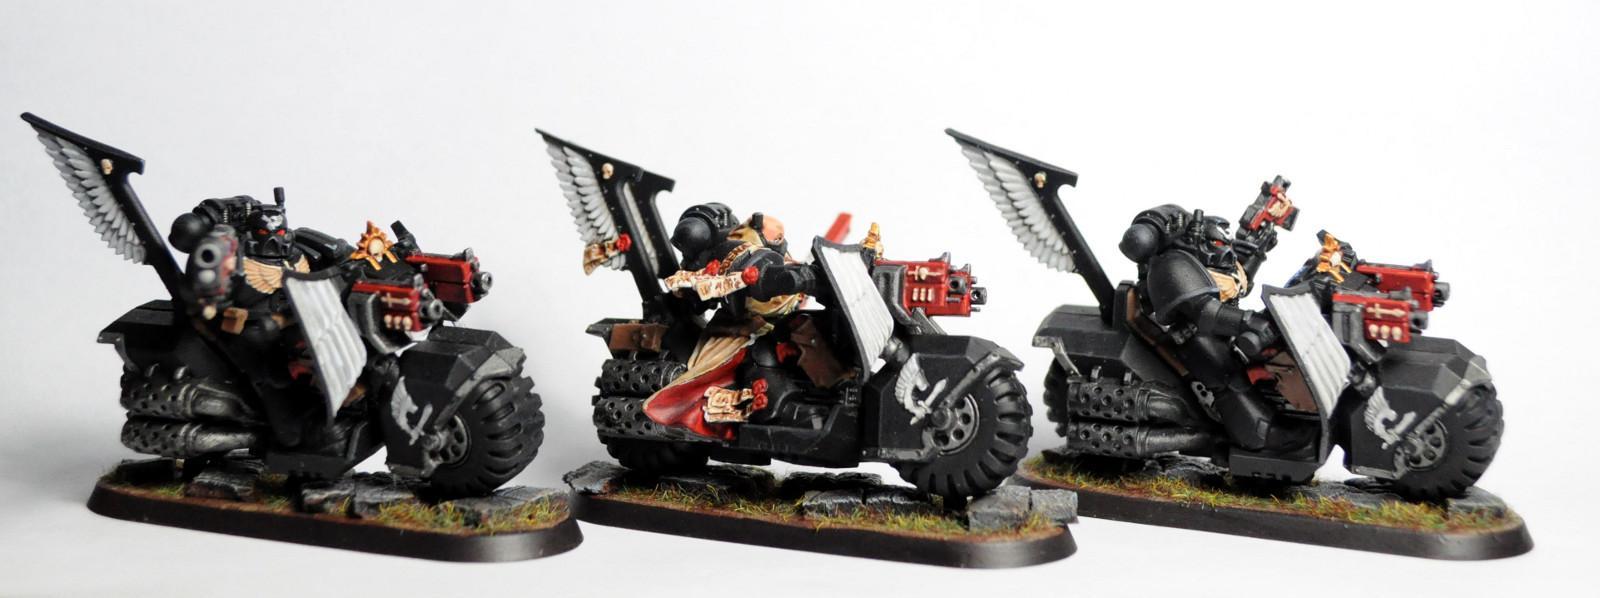 Dark Angels, Ravenwing, Space Marines, Warhammer 40,000